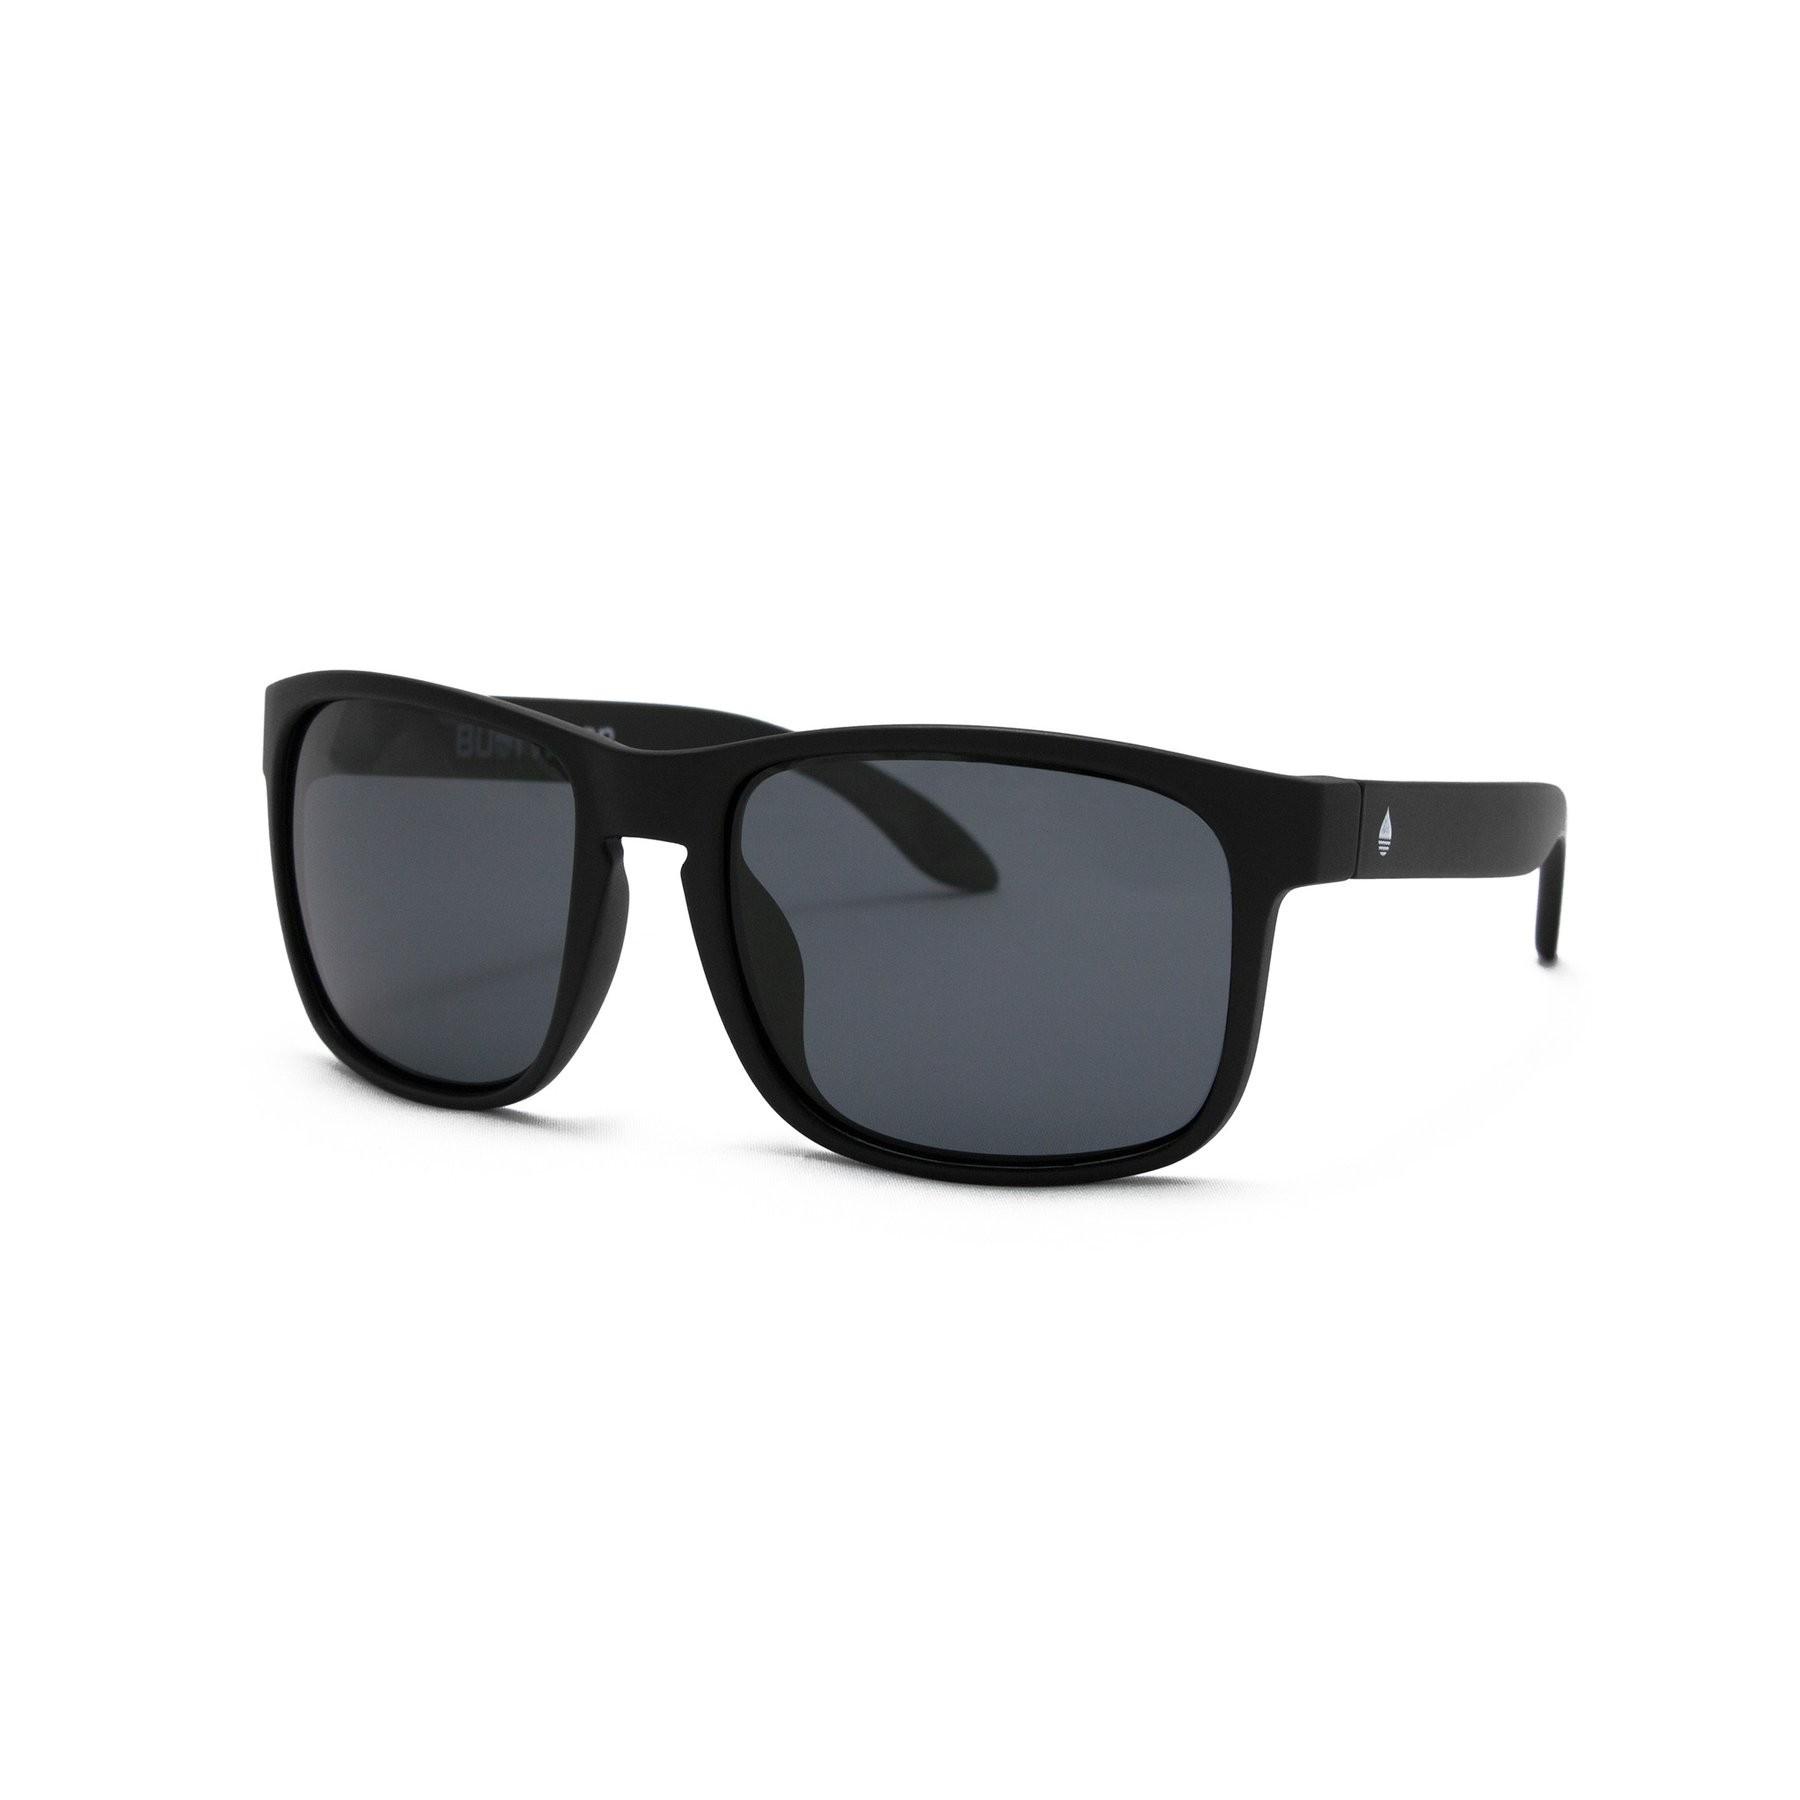 Buoy Wear Floating Cap - Floating Sunglasses